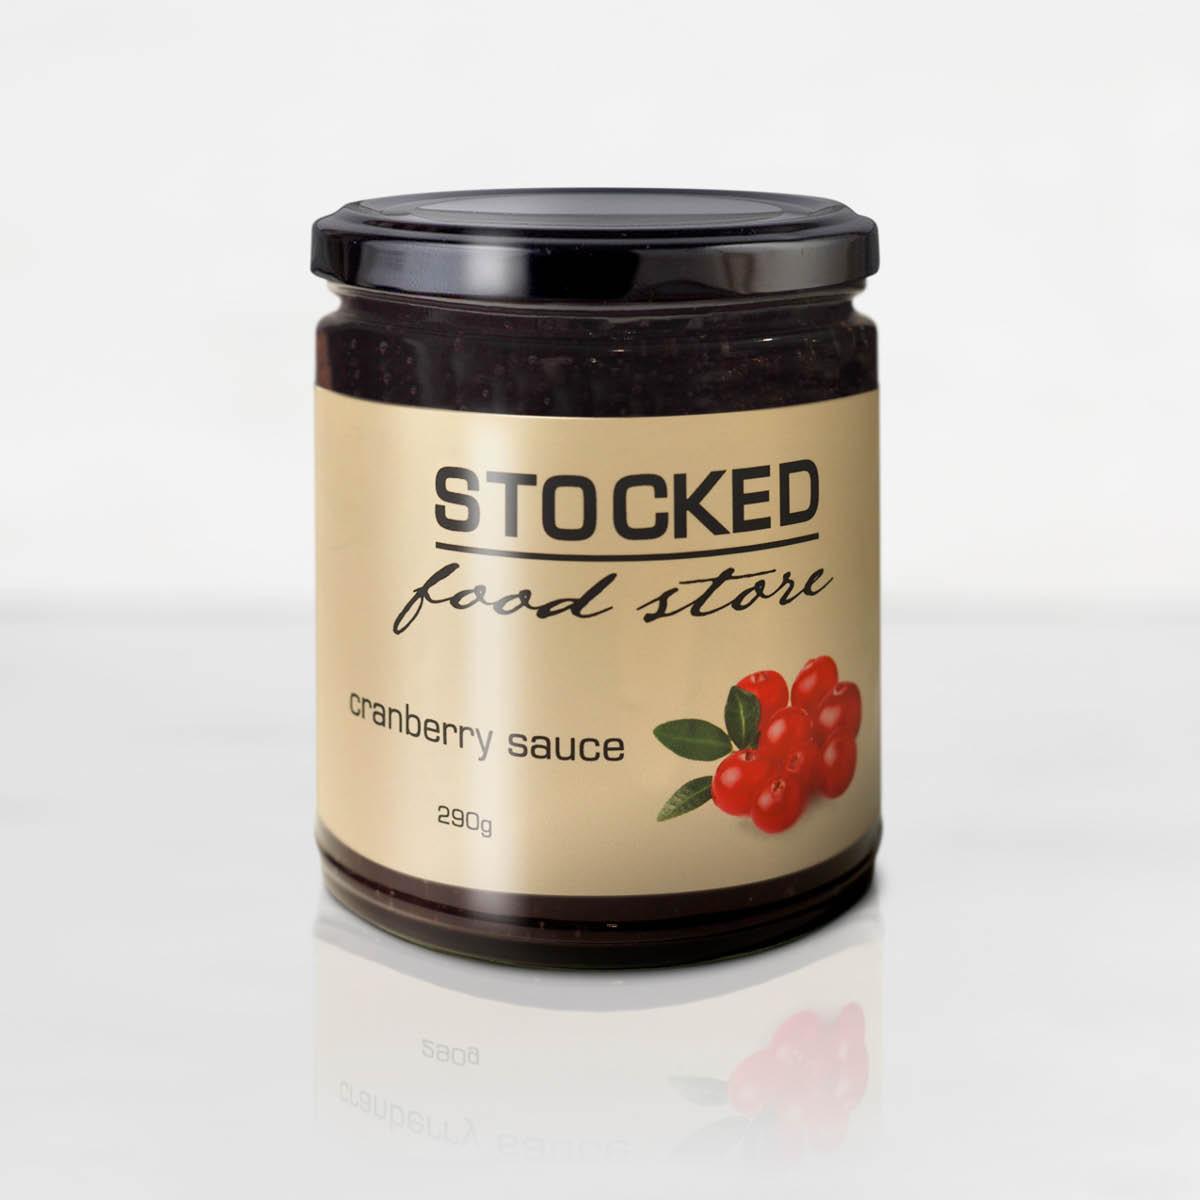 Stocked Cranberry Sauce